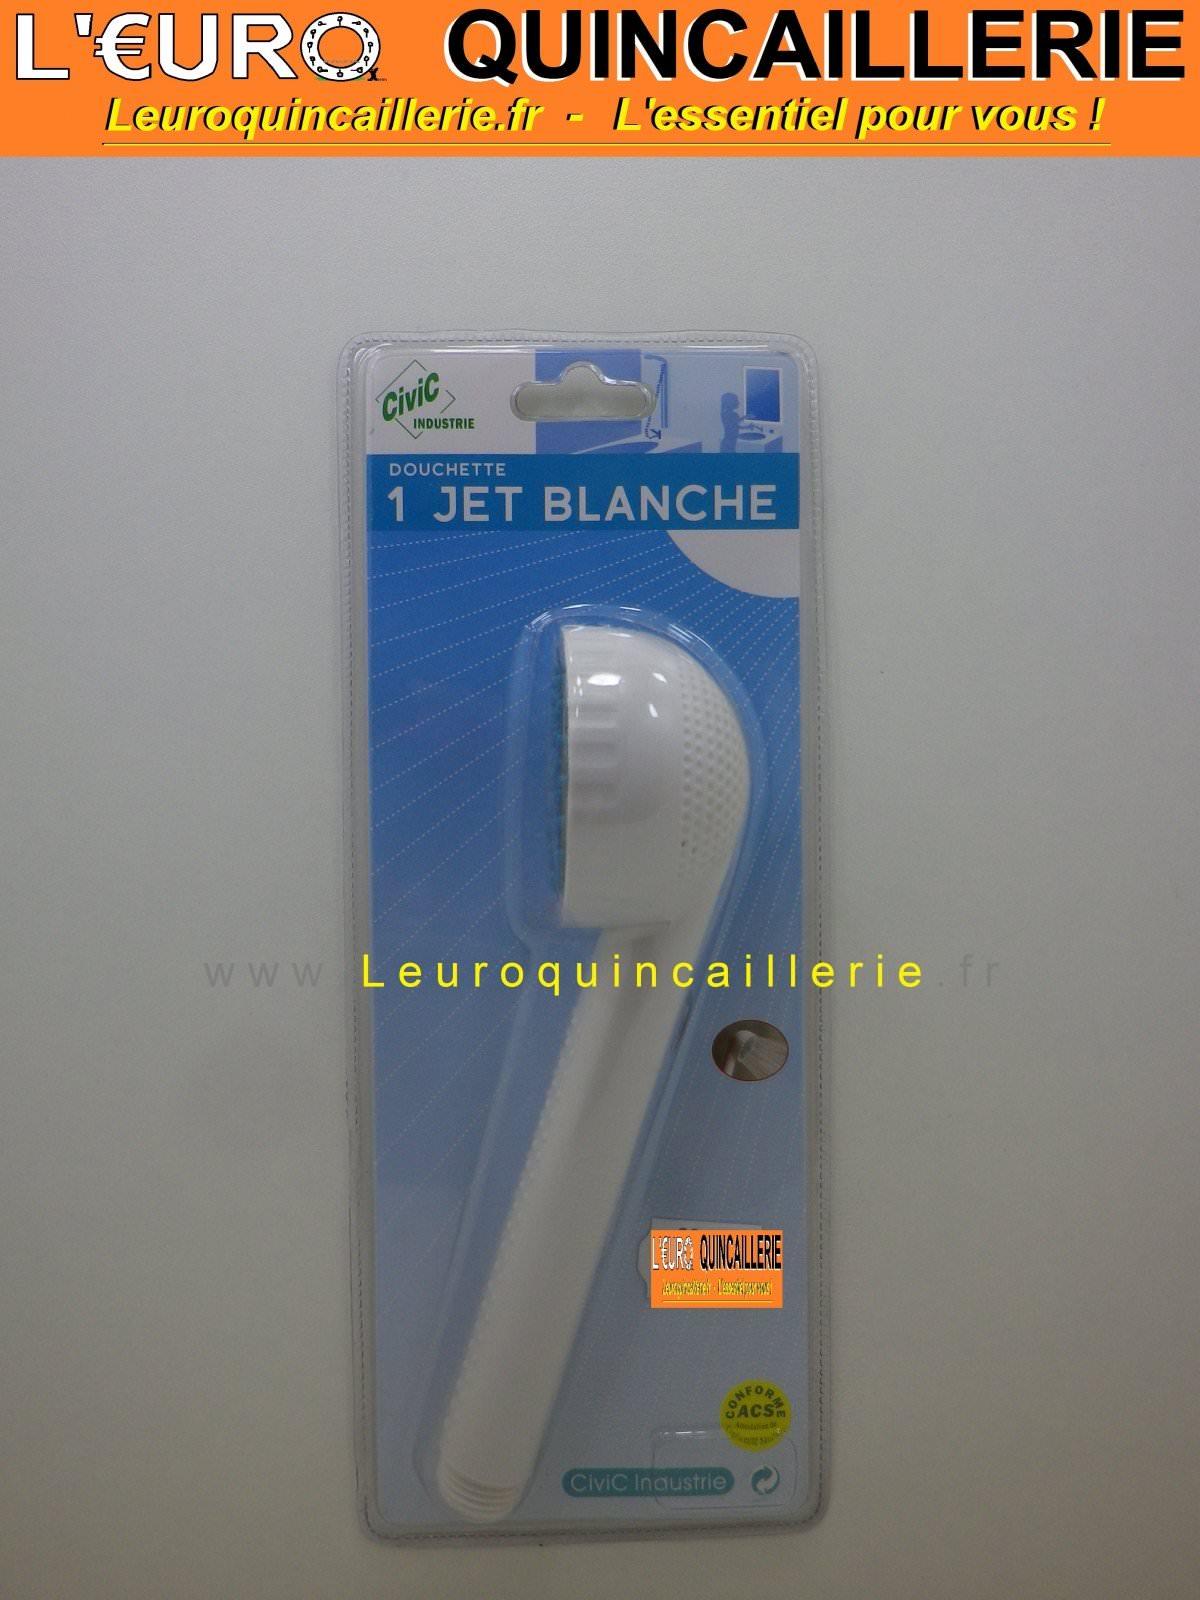 Douchette 1 jet blanche